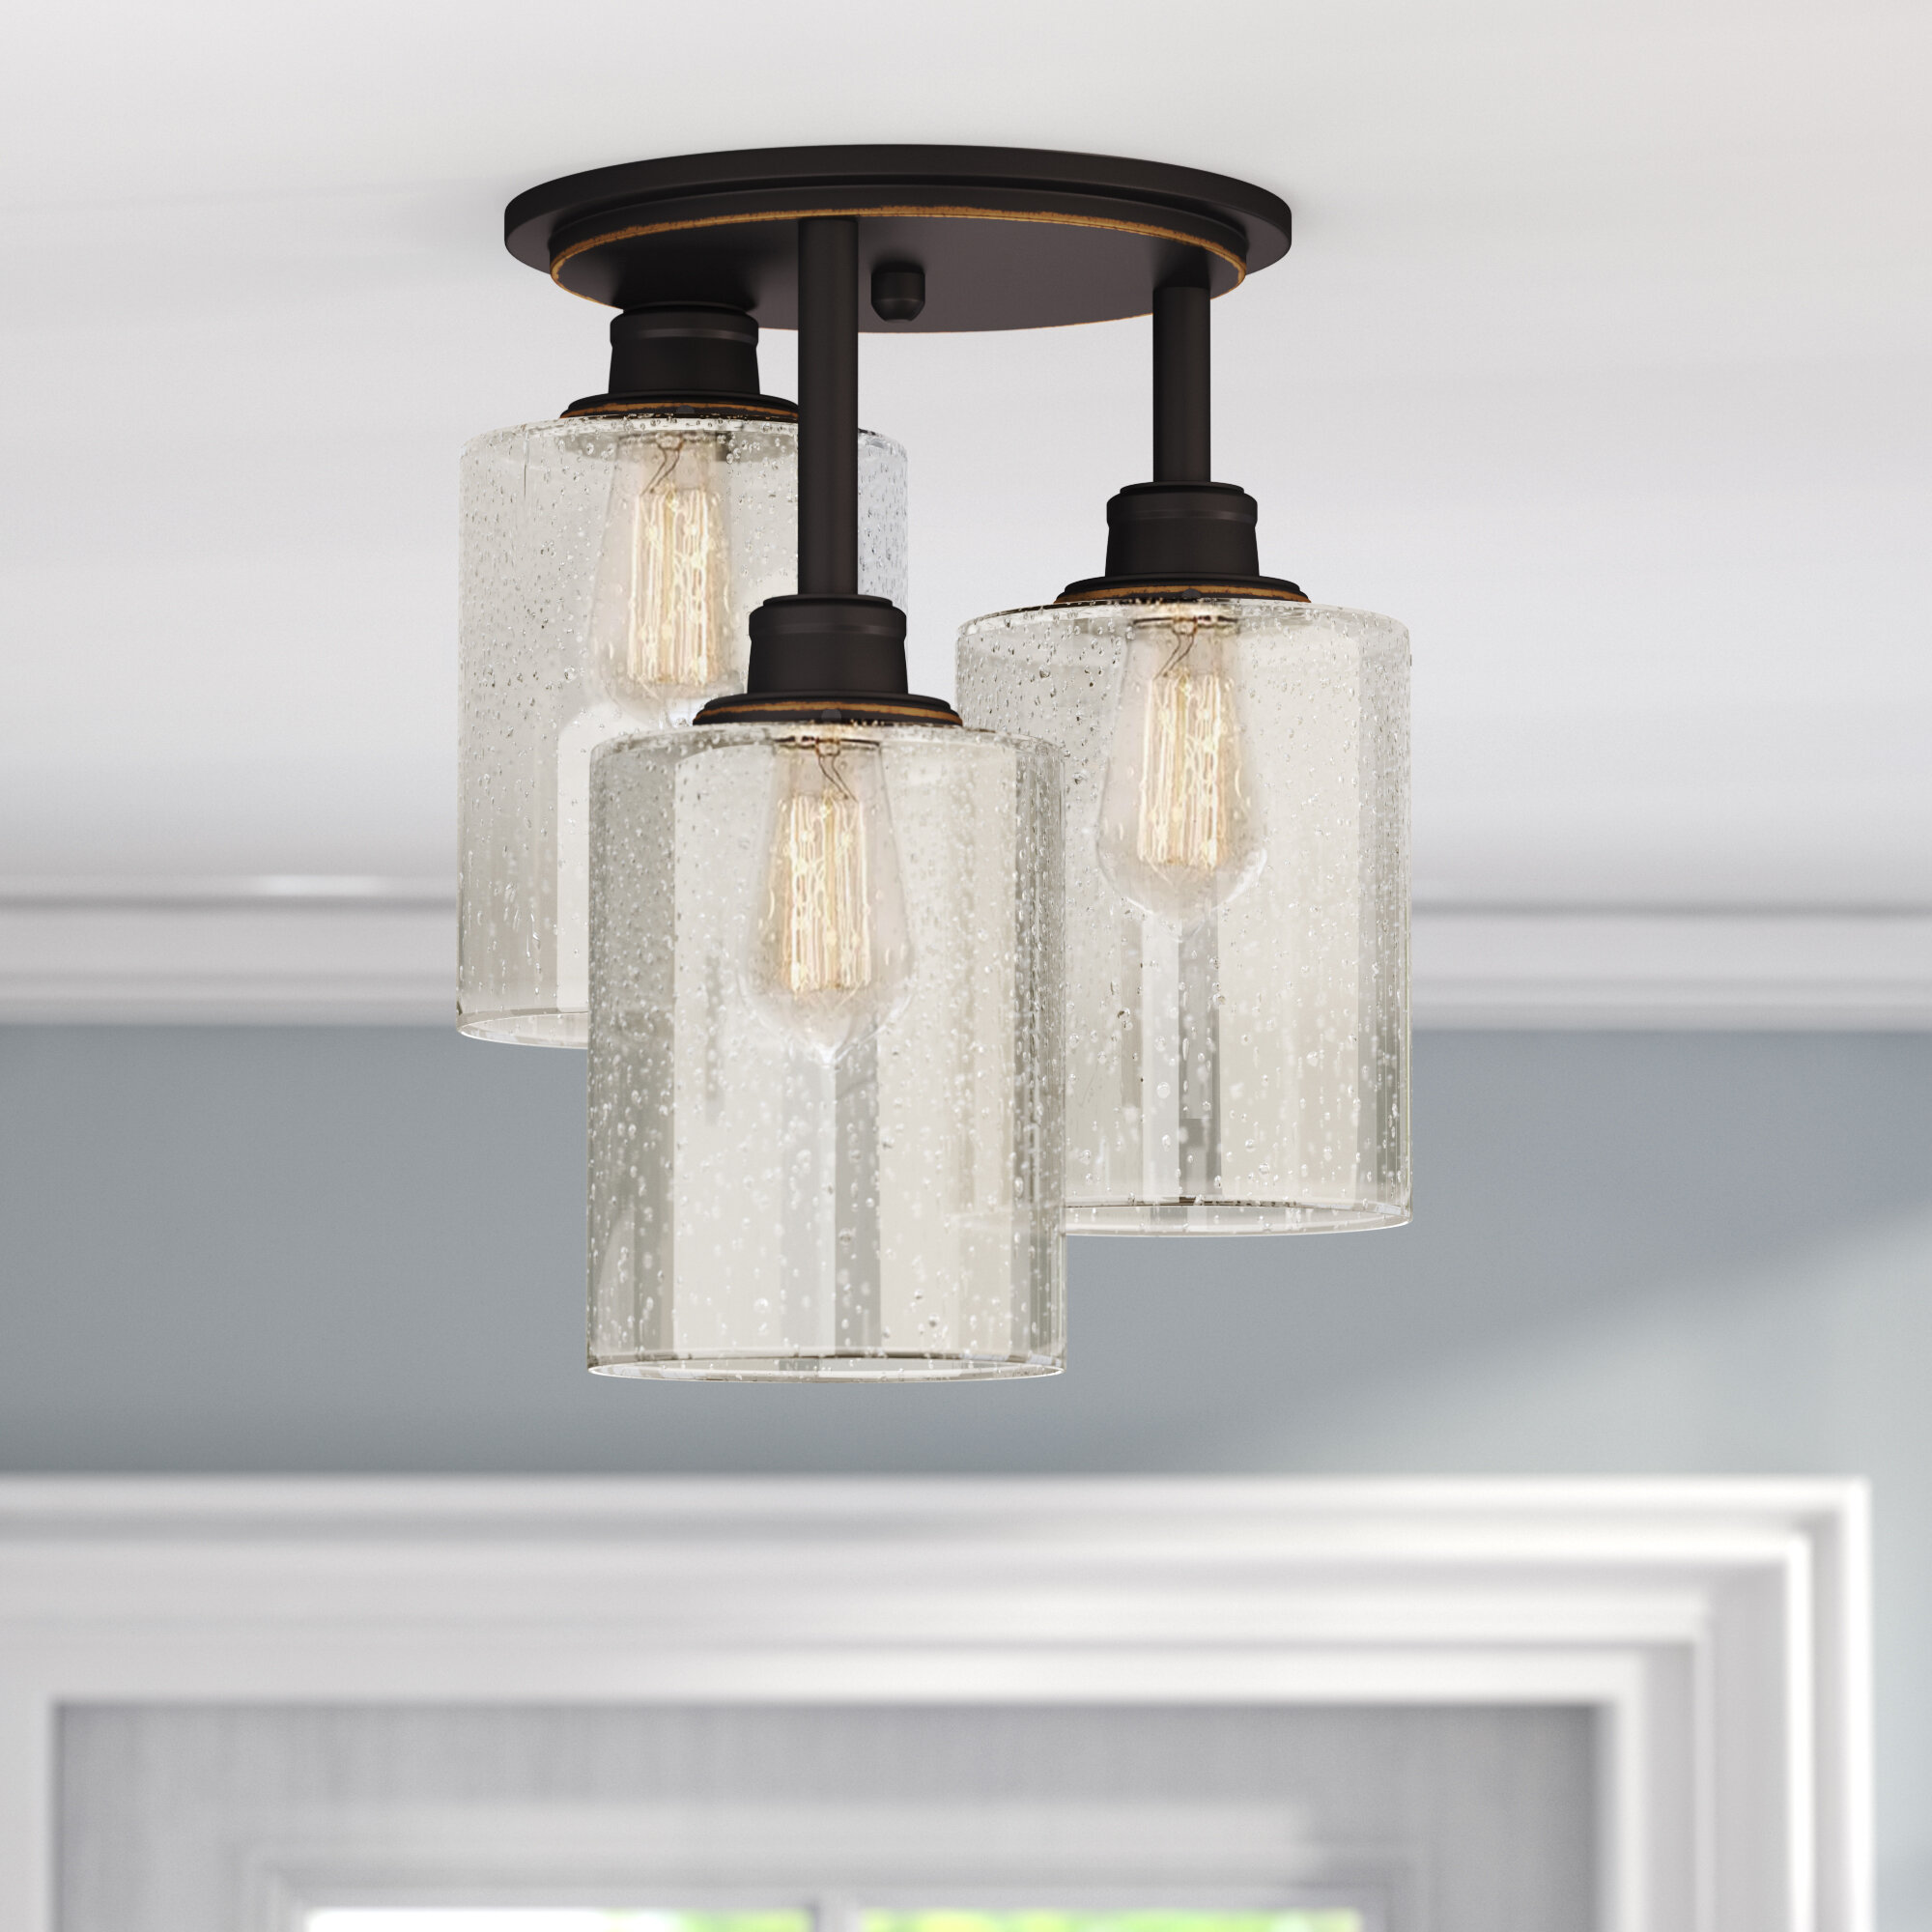 d56a056e125f9 Gracie Oaks Blackman 3-Light Semi Flush Mount   Reviews